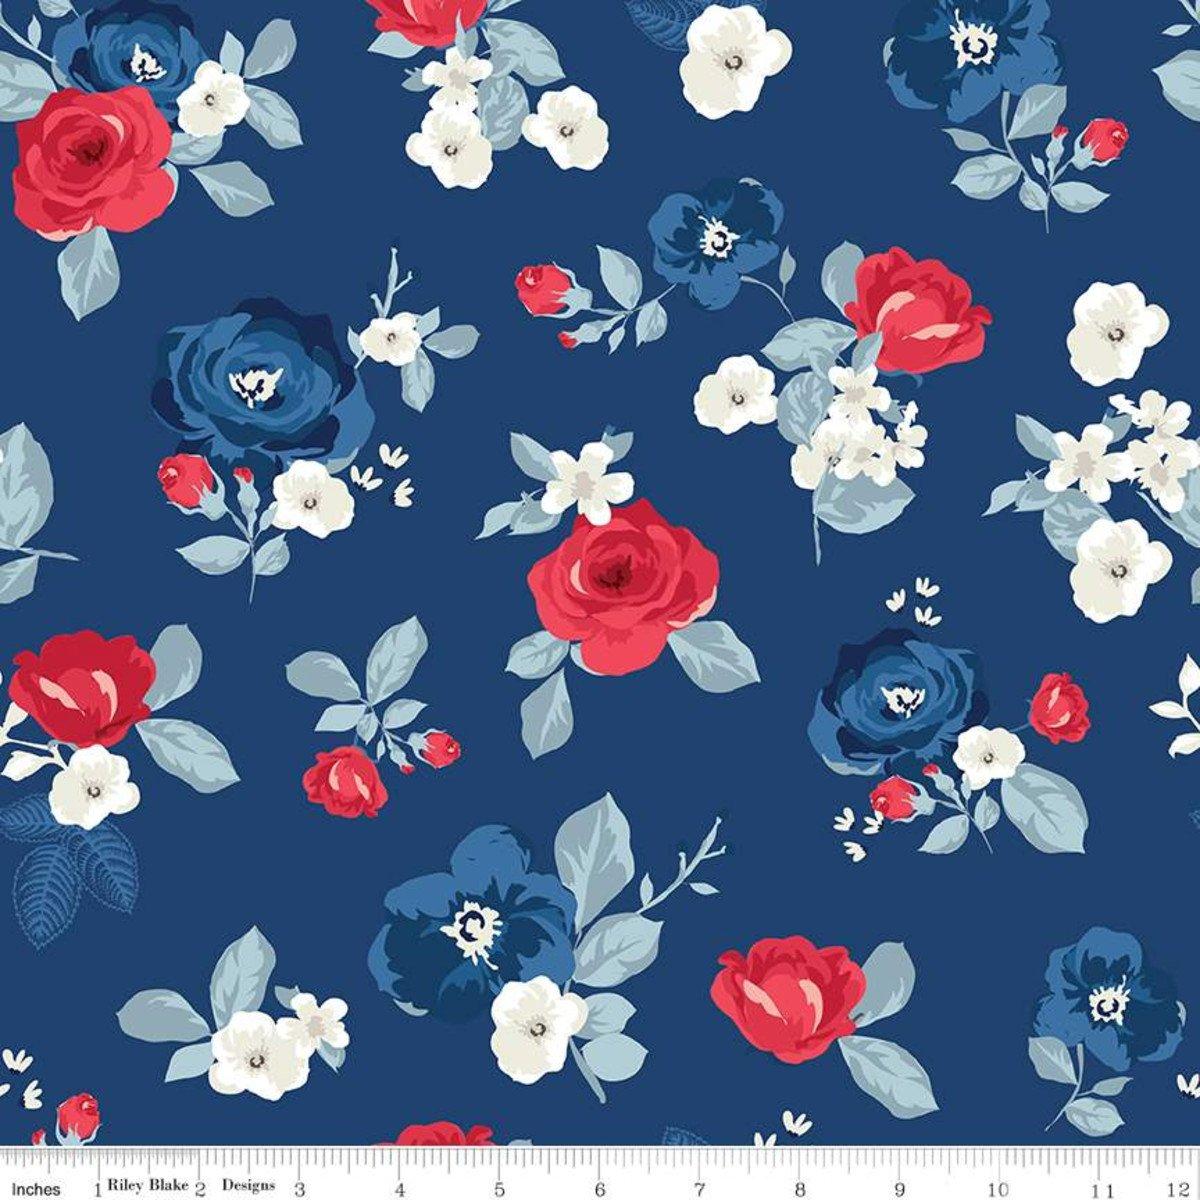 Land of Liberty C10560 Roses Navy